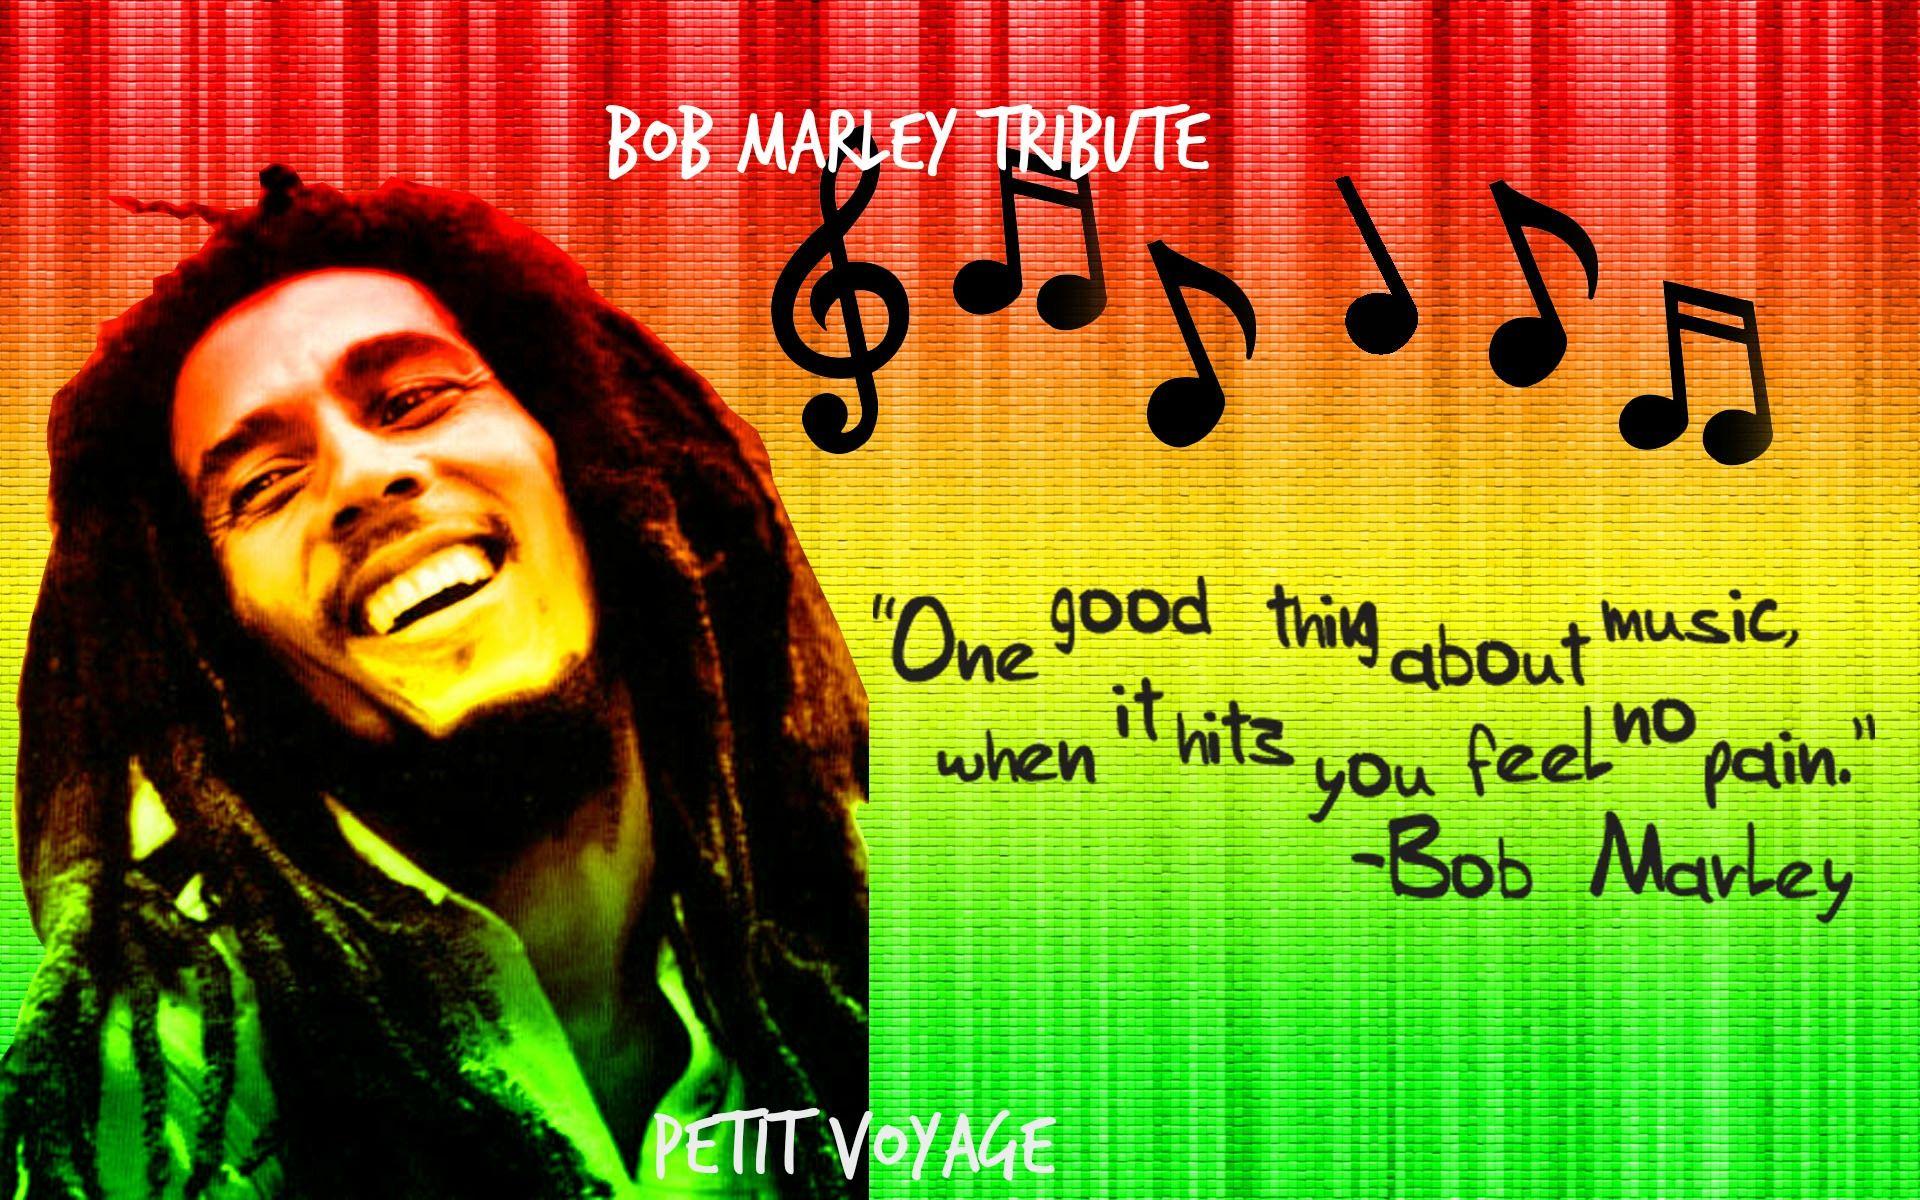 Bob Marley Tribute 70 years.